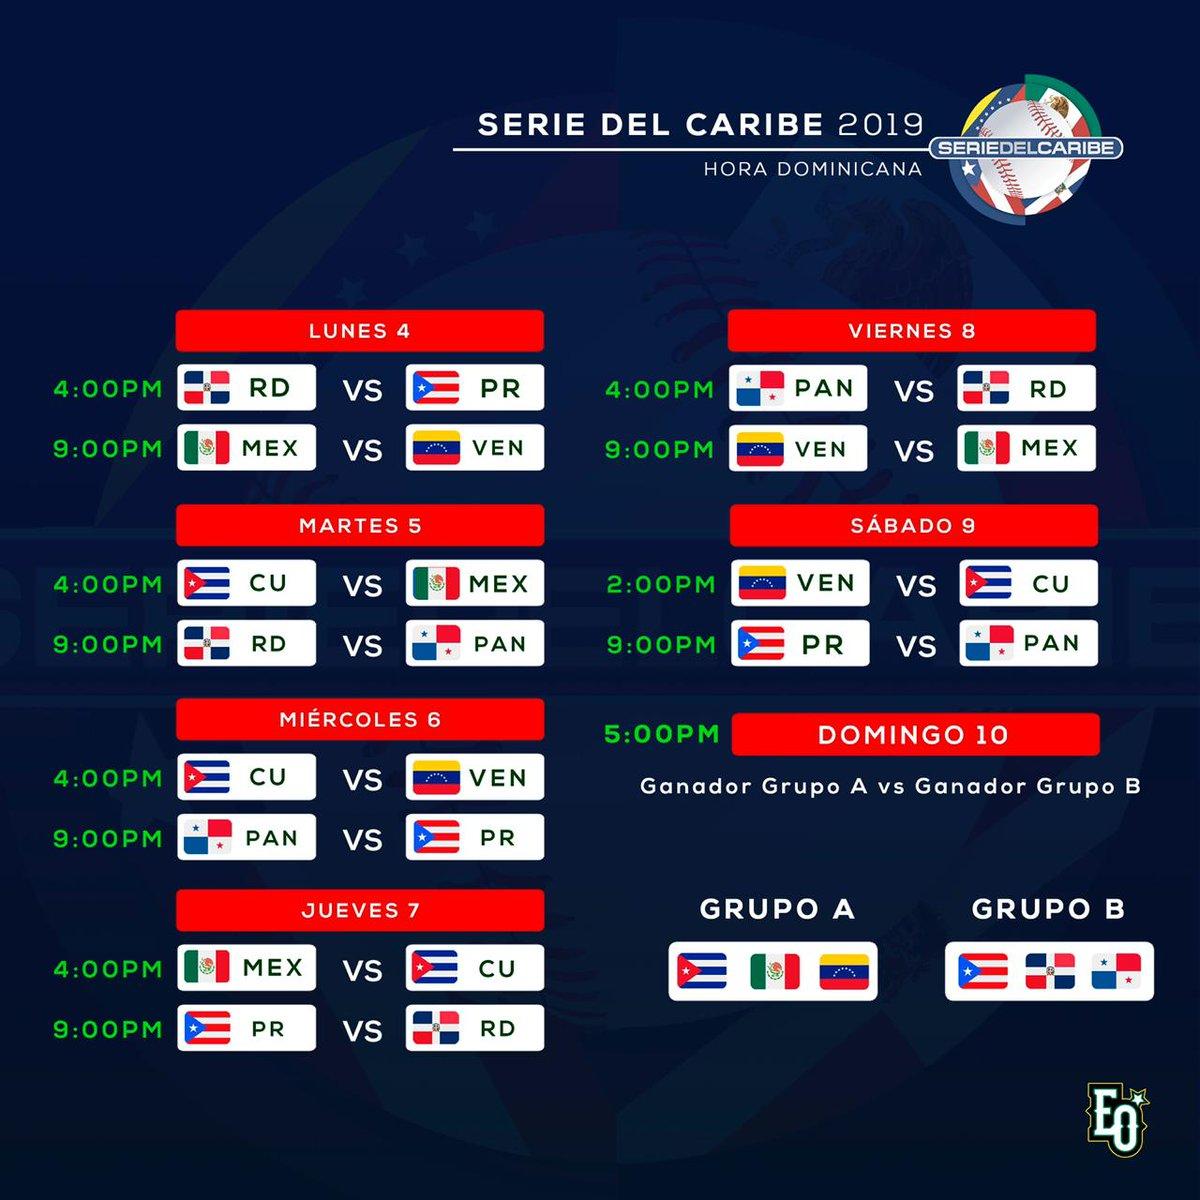 Eobaseballclub Di Twitter Calendario De La Serie Del Caribe 2019